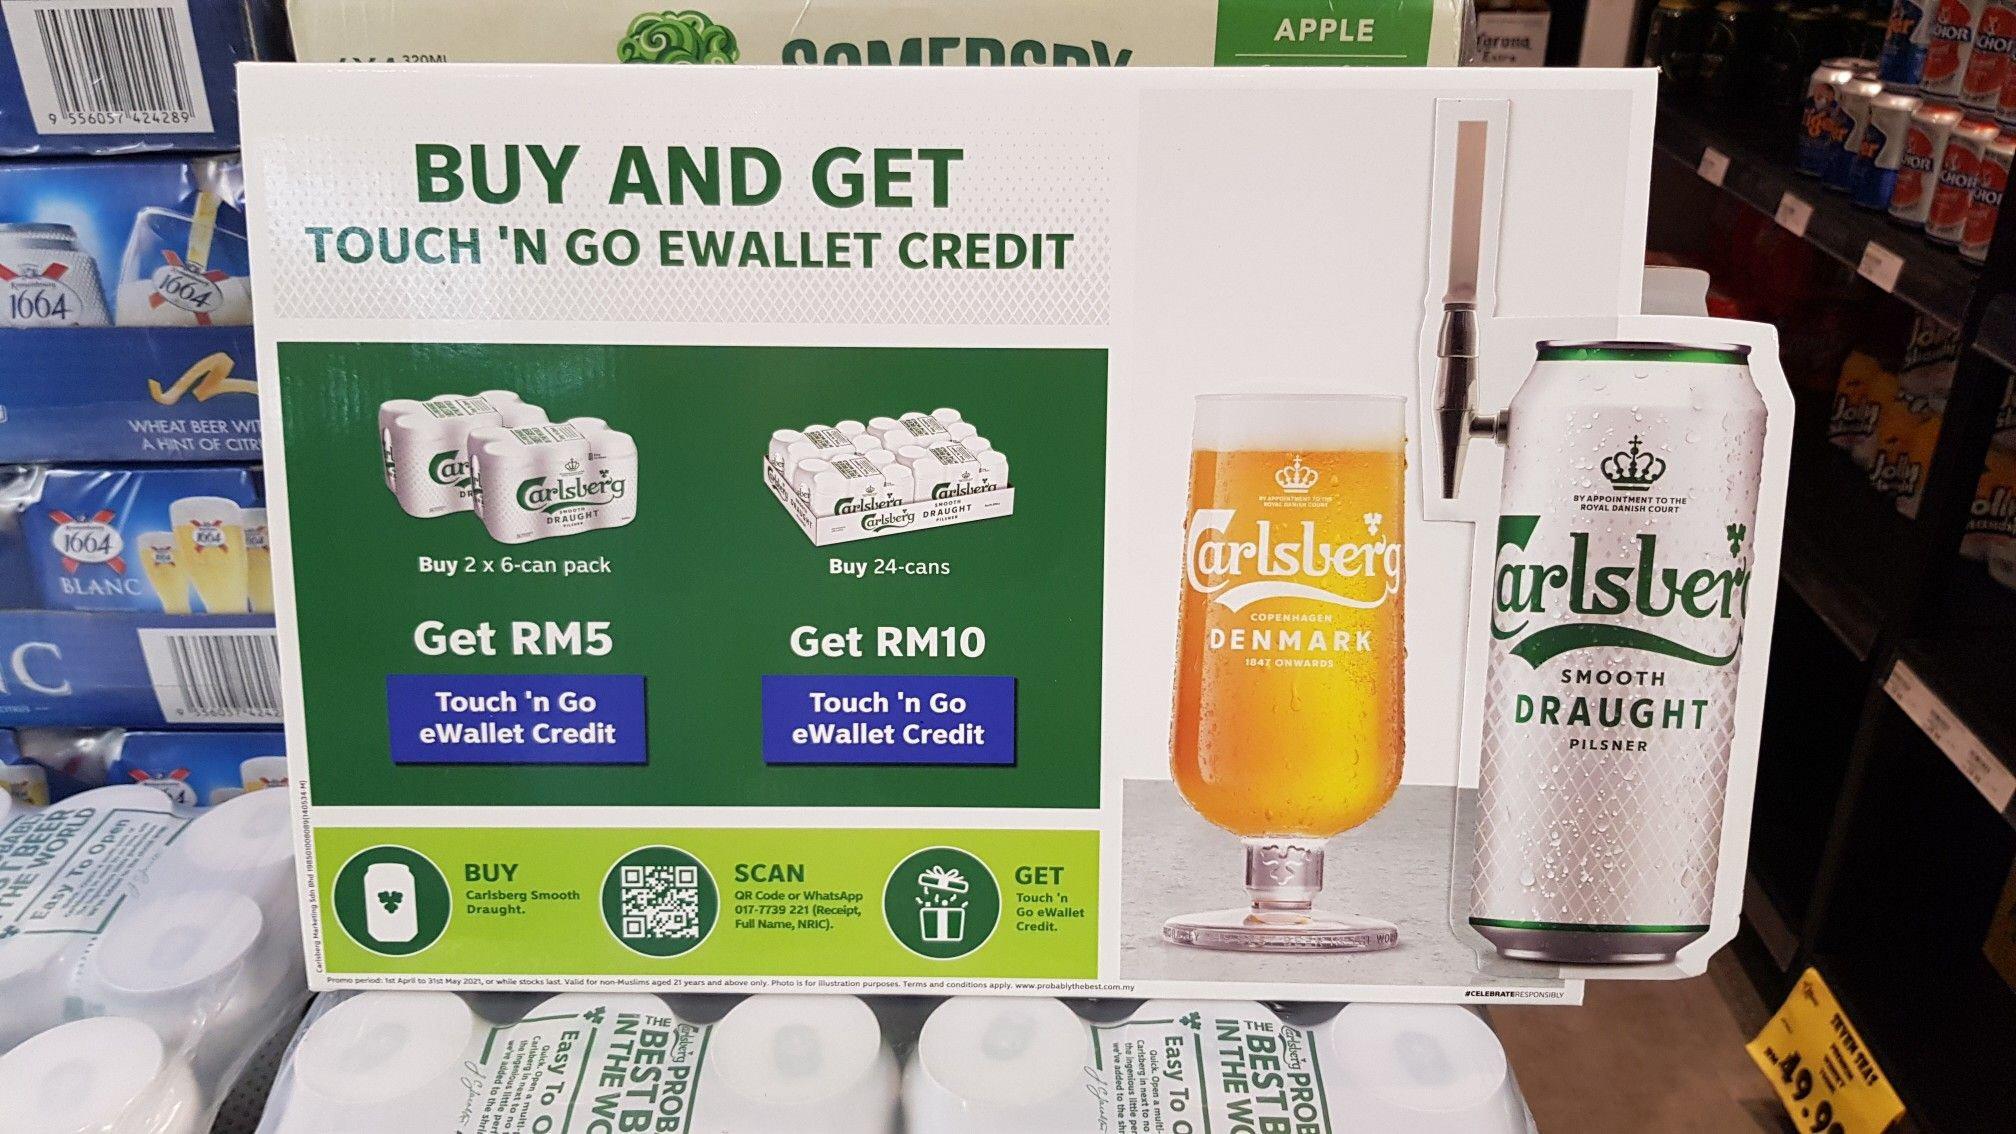 Carlsberg: Buy & Get E-Wallet Credit